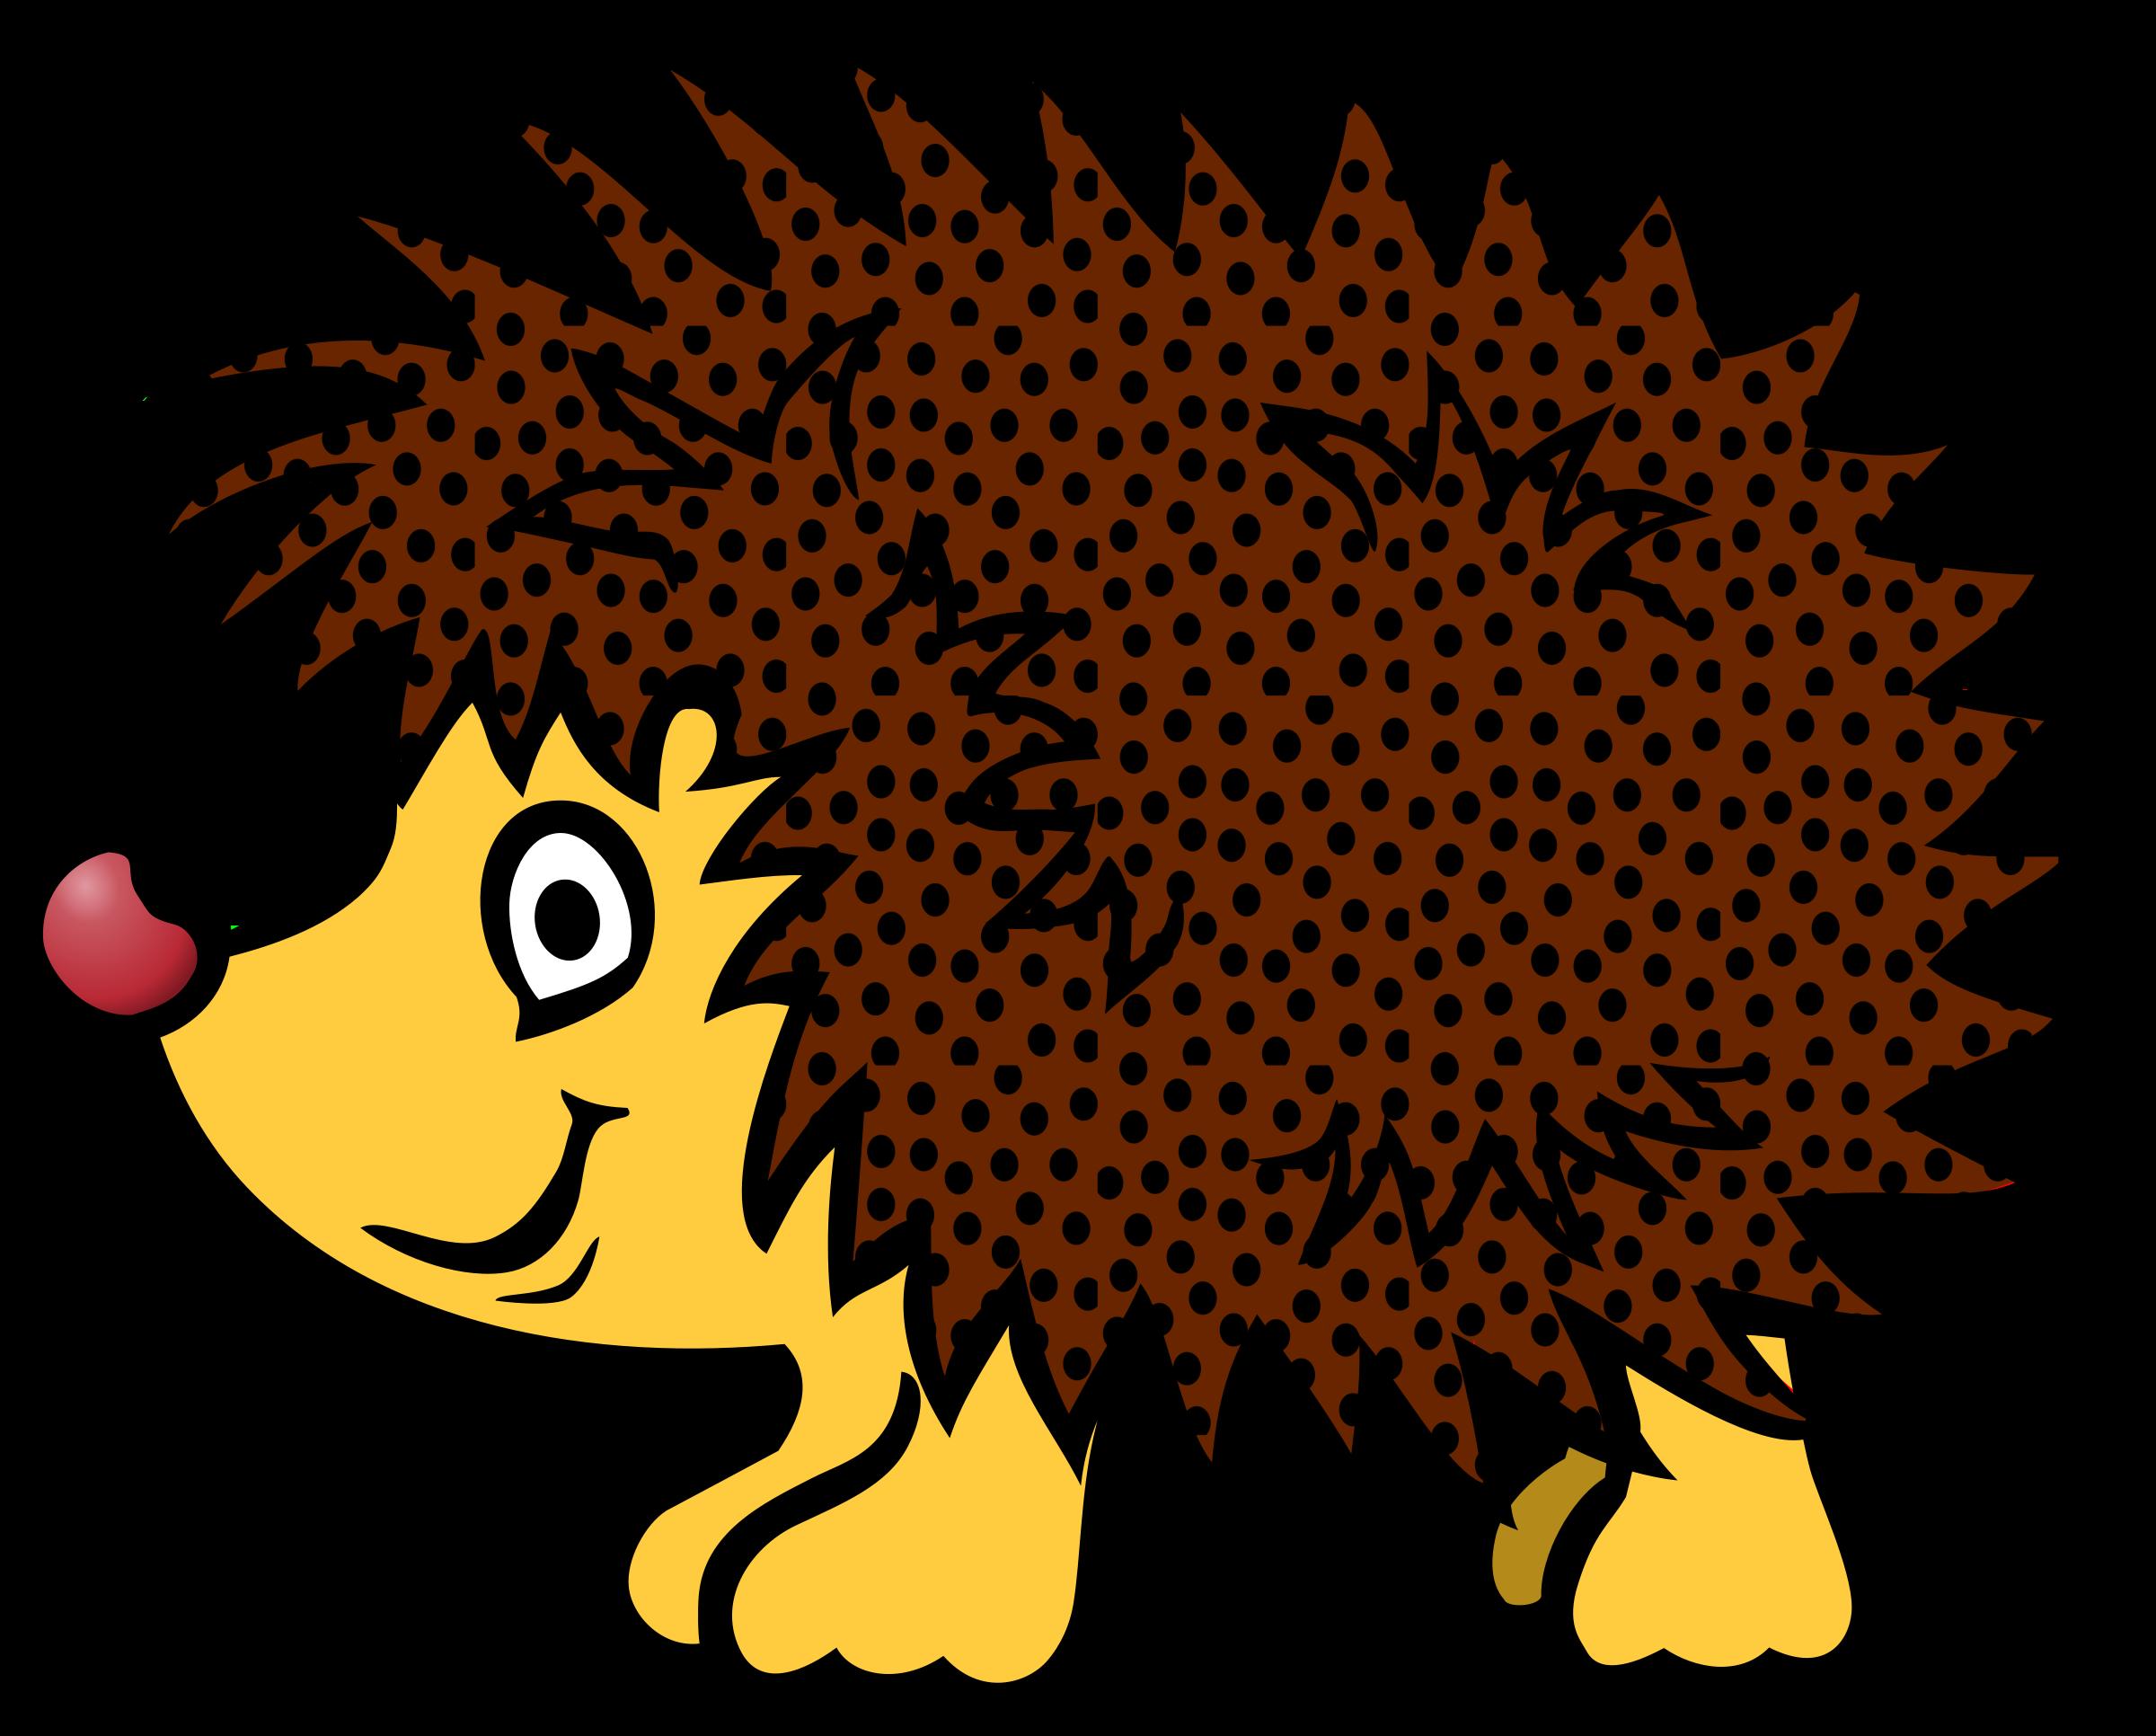 Hedgehog clipart Hedgehog The Cliparts Clipart Hedgehog